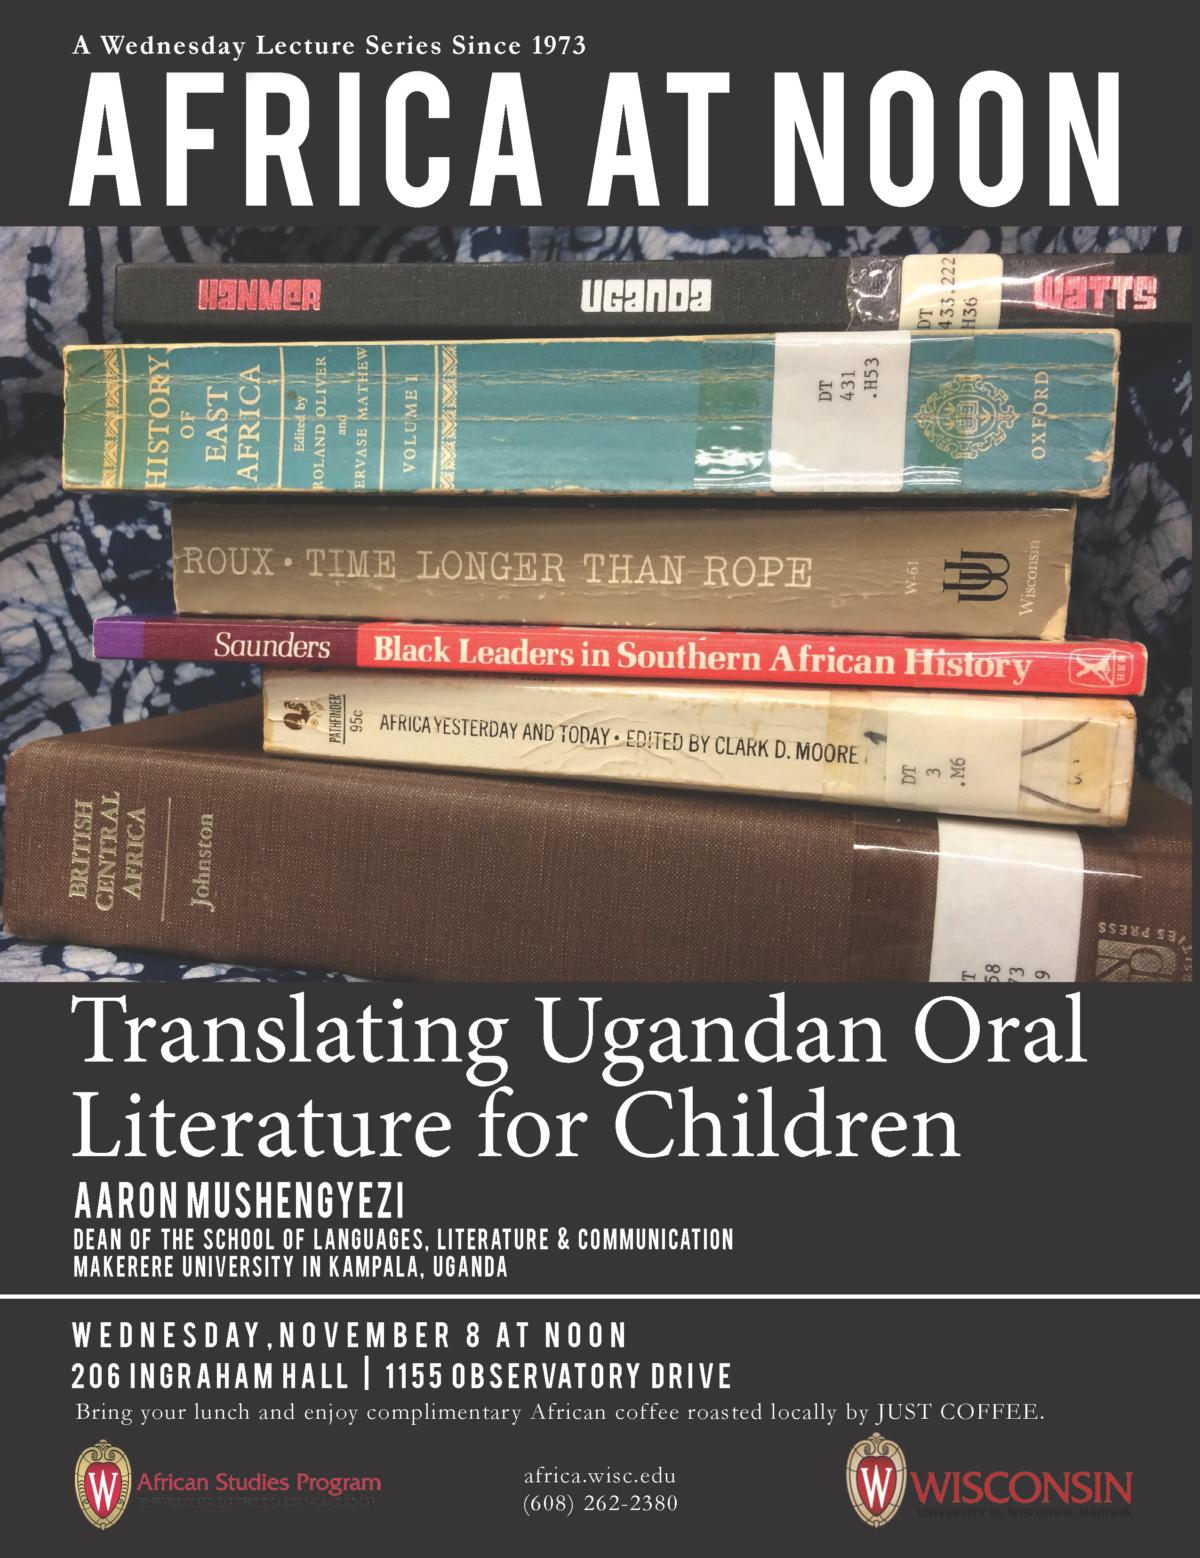 Event Poster: Aaron Mushengyezi